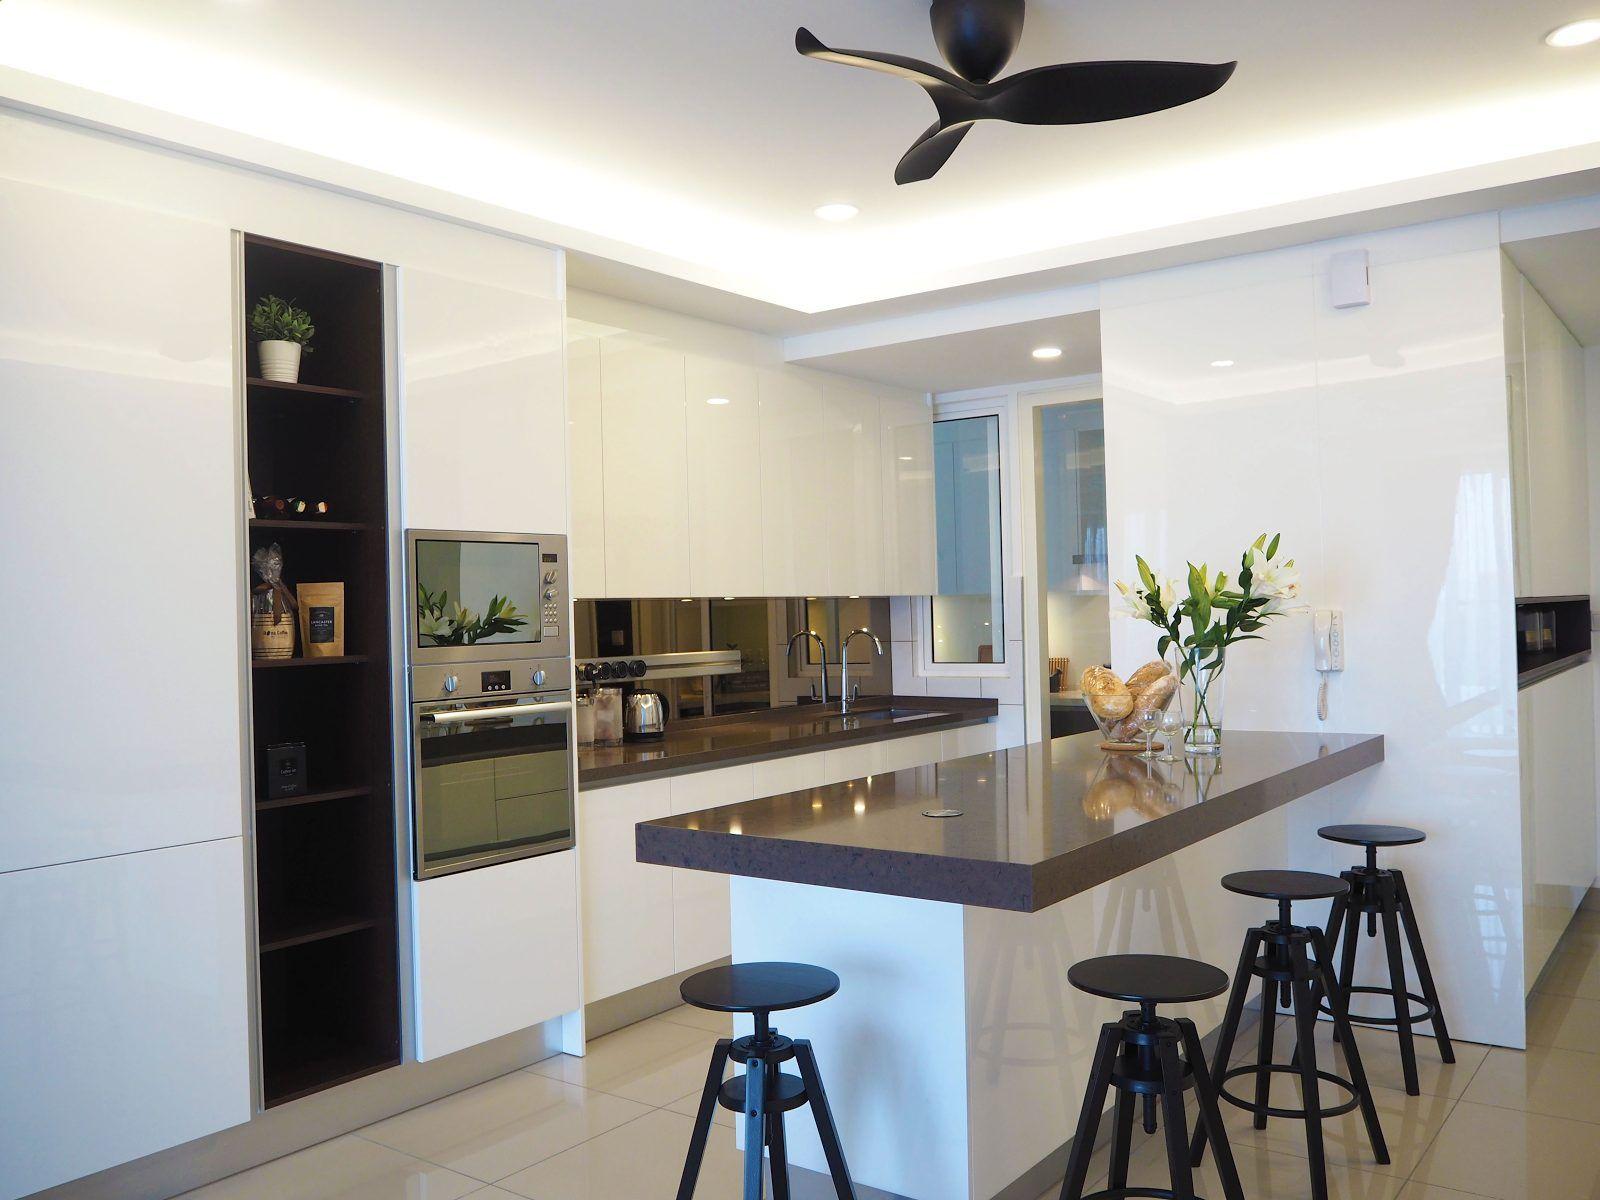 50 Malaysian Kitchen Designs And Ideas Kitchen Pinterest